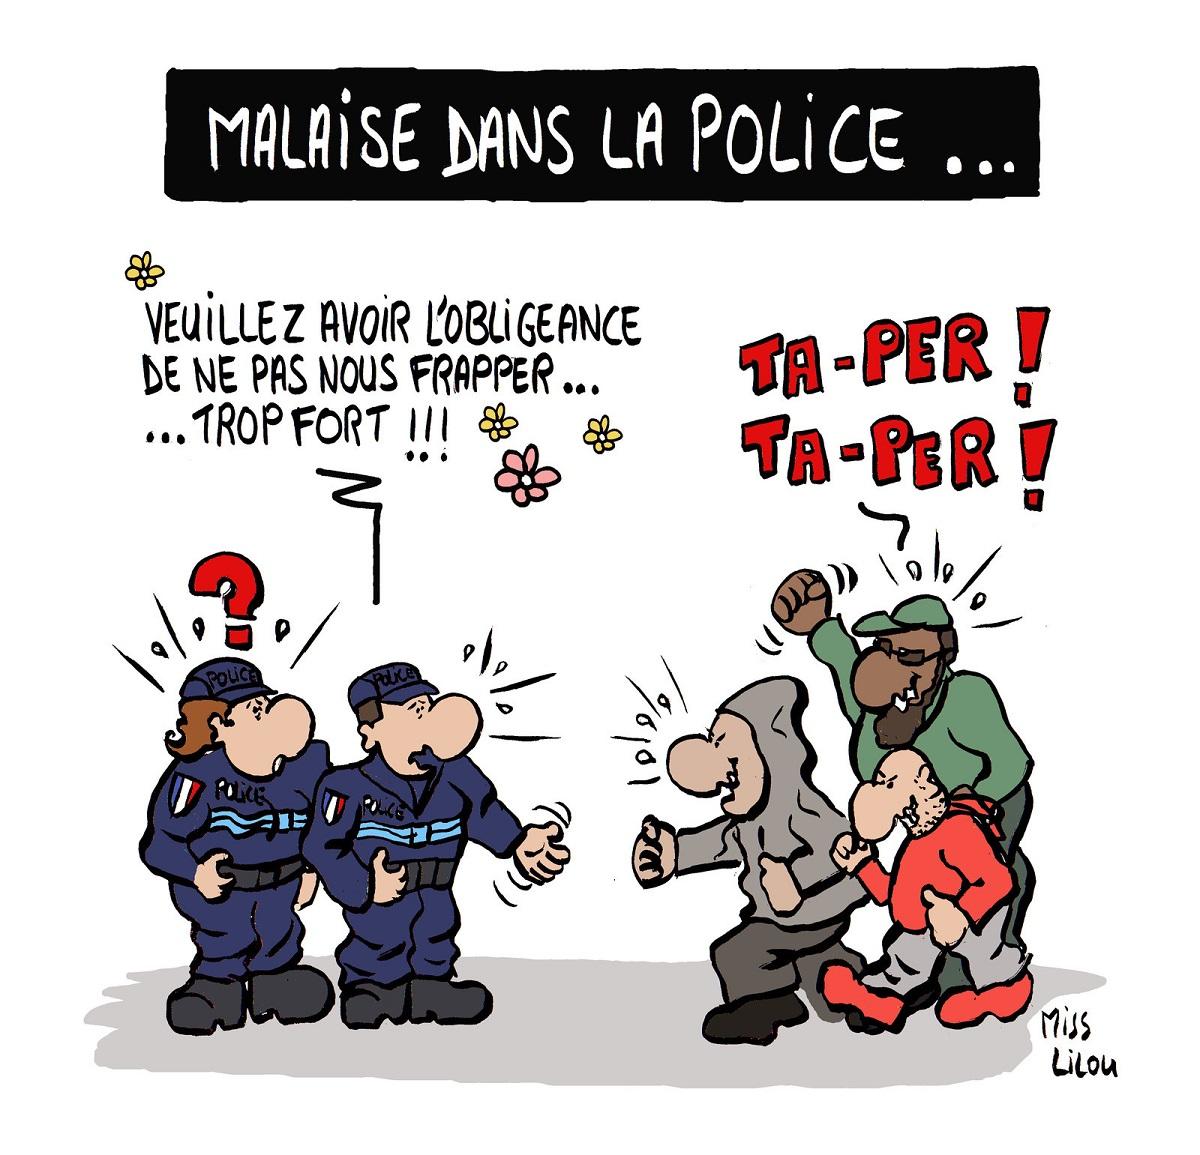 dessin humoristique de délinquants qui agressent des policiers